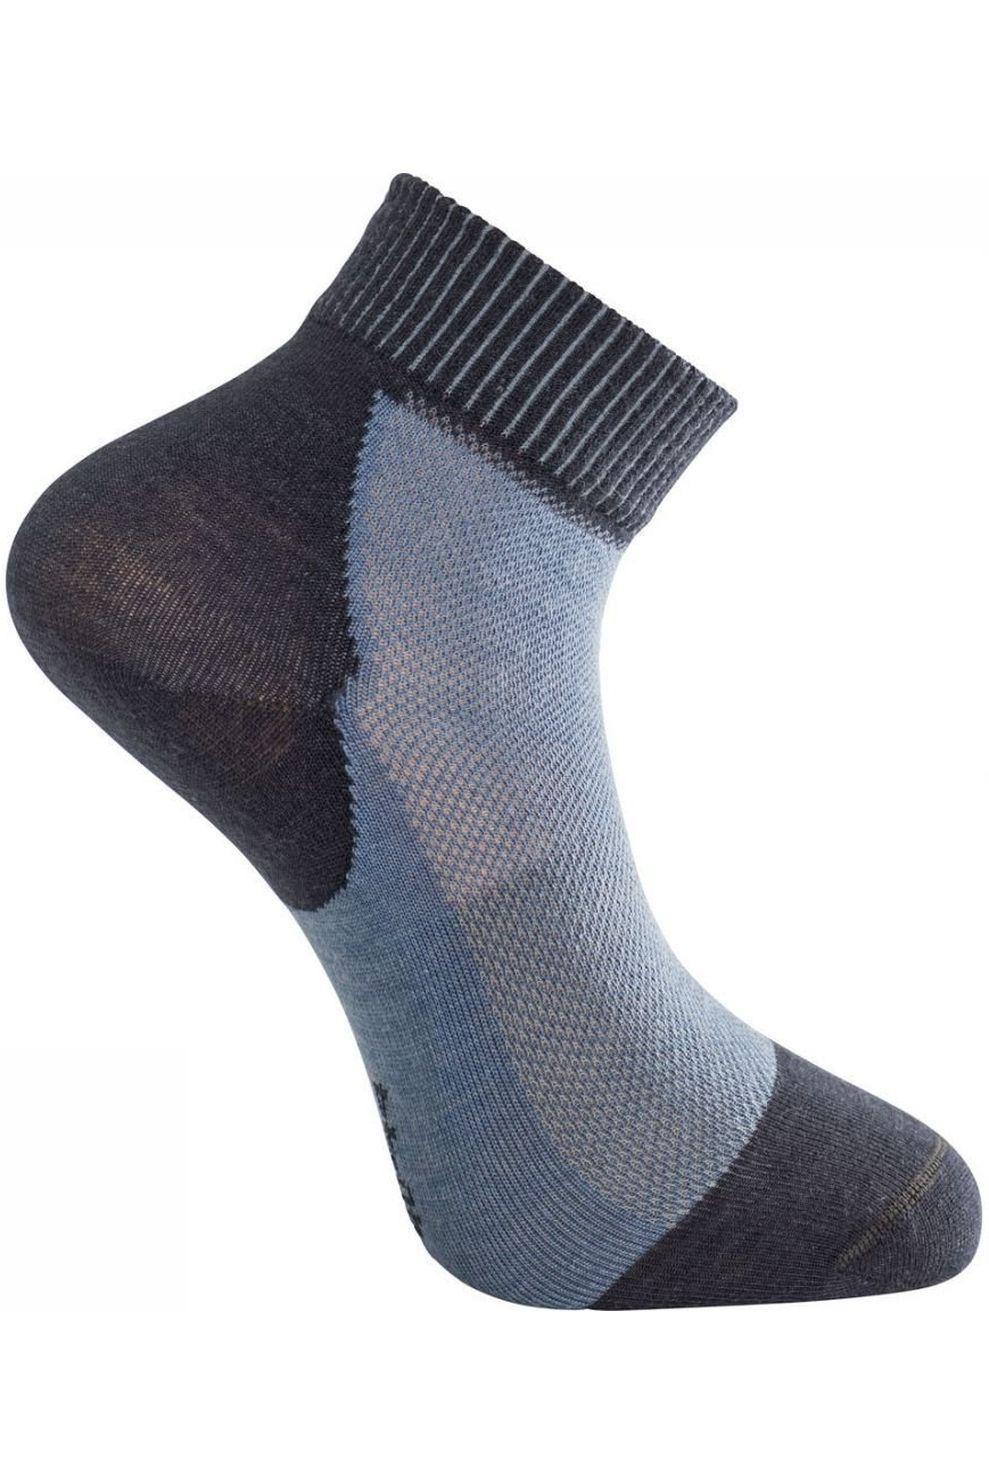 Woolpower Kous Skilled Short Liner - Blauw - Maat: 45/48